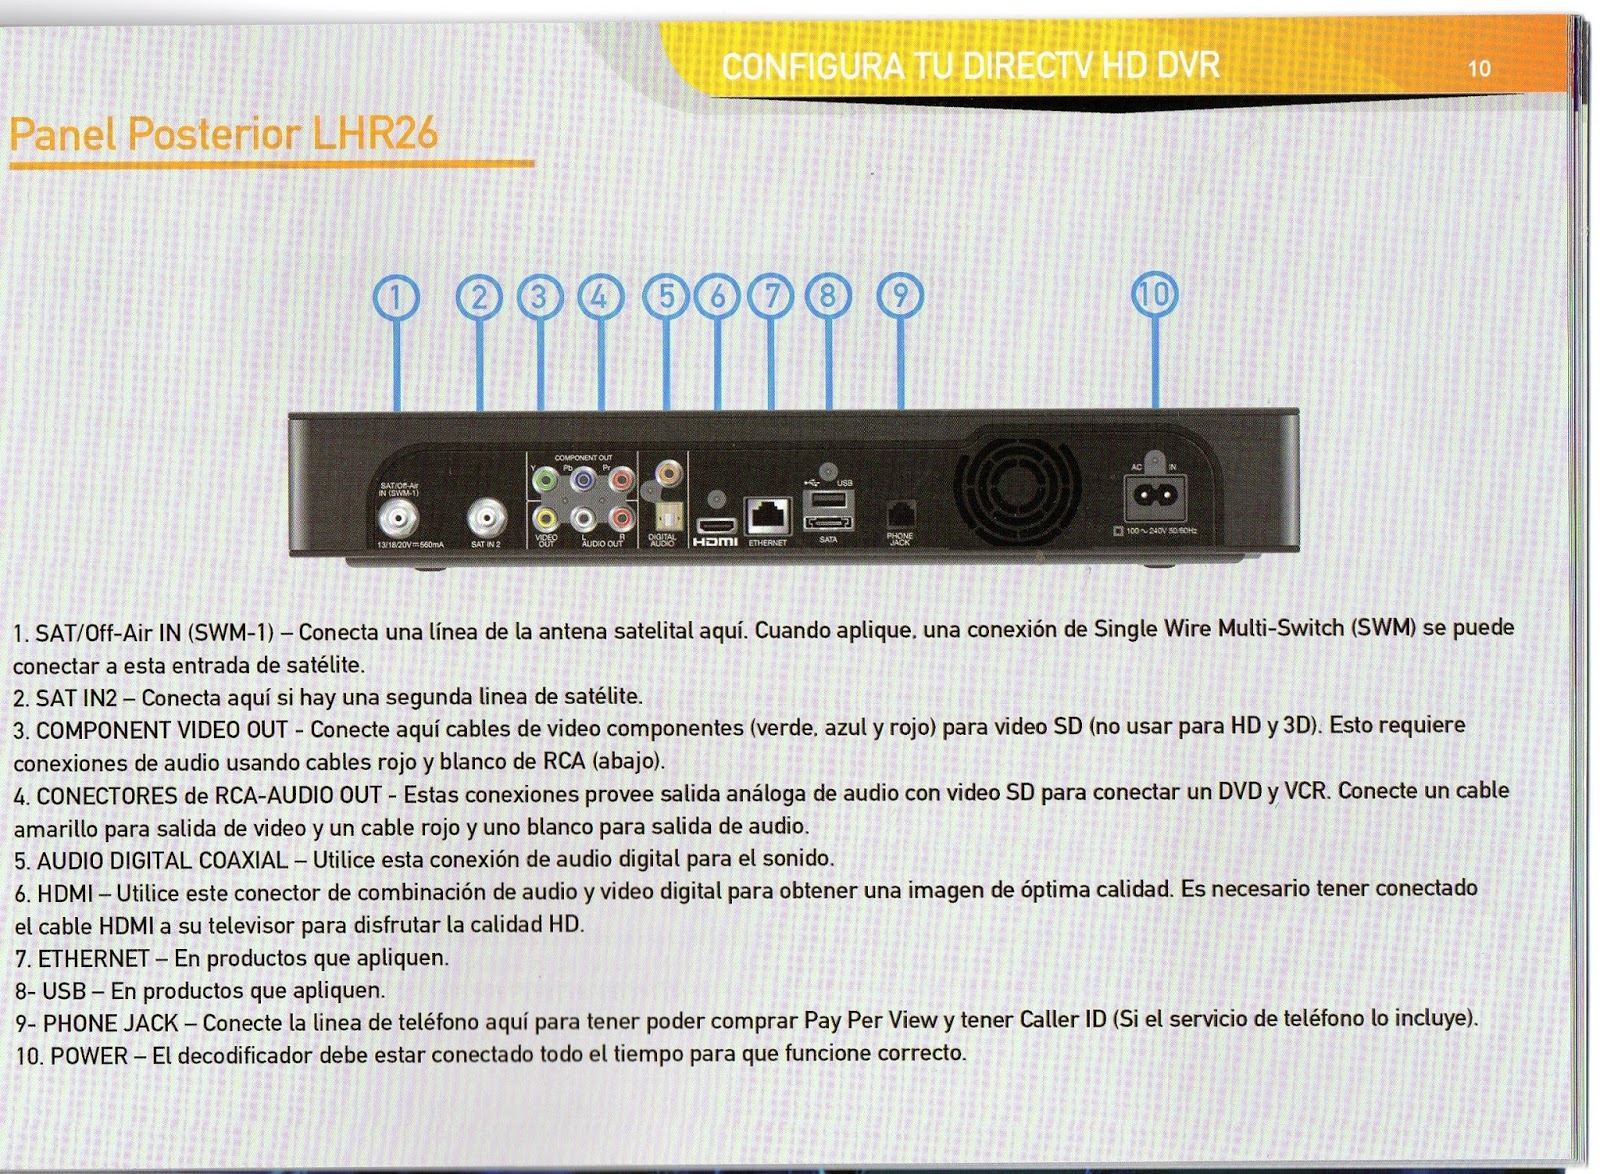 La copaamrica sentitecampeon tecnico instalador kit directv directv venta  instalacion kit prepago. Encontr kit prepago nuevo siglo mercado libre  uruguay.